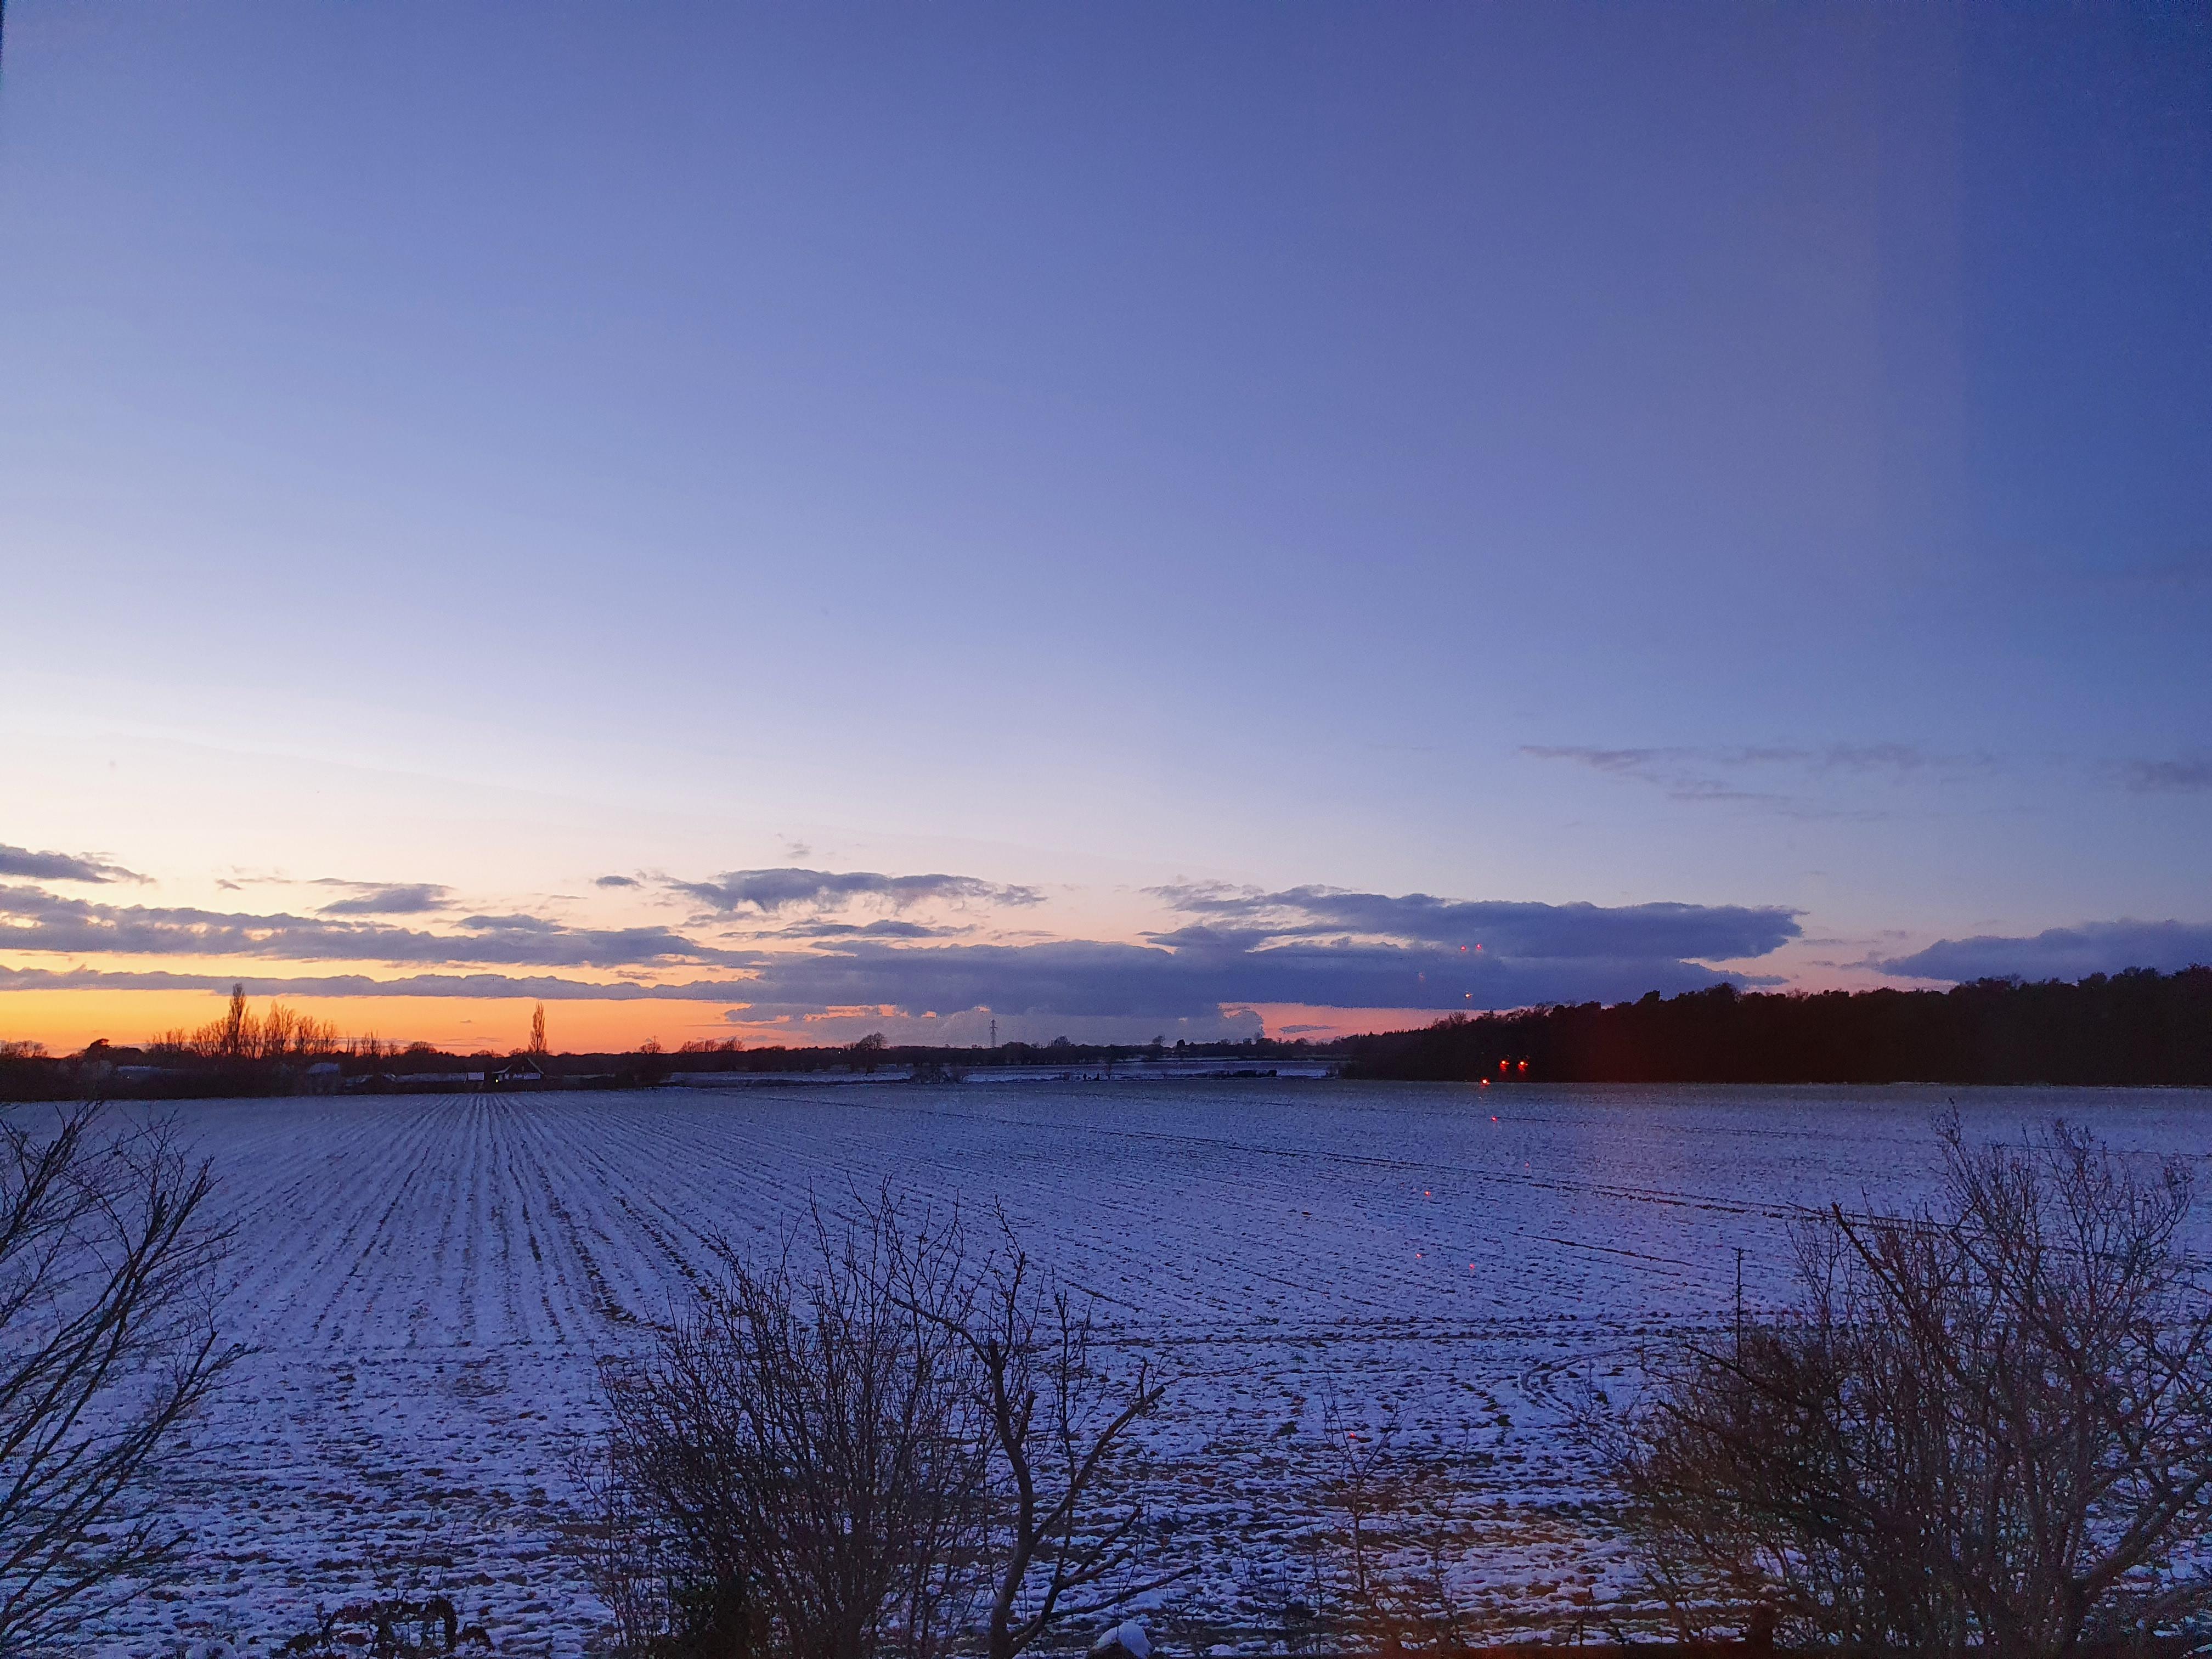 A snowy horizon at dusk